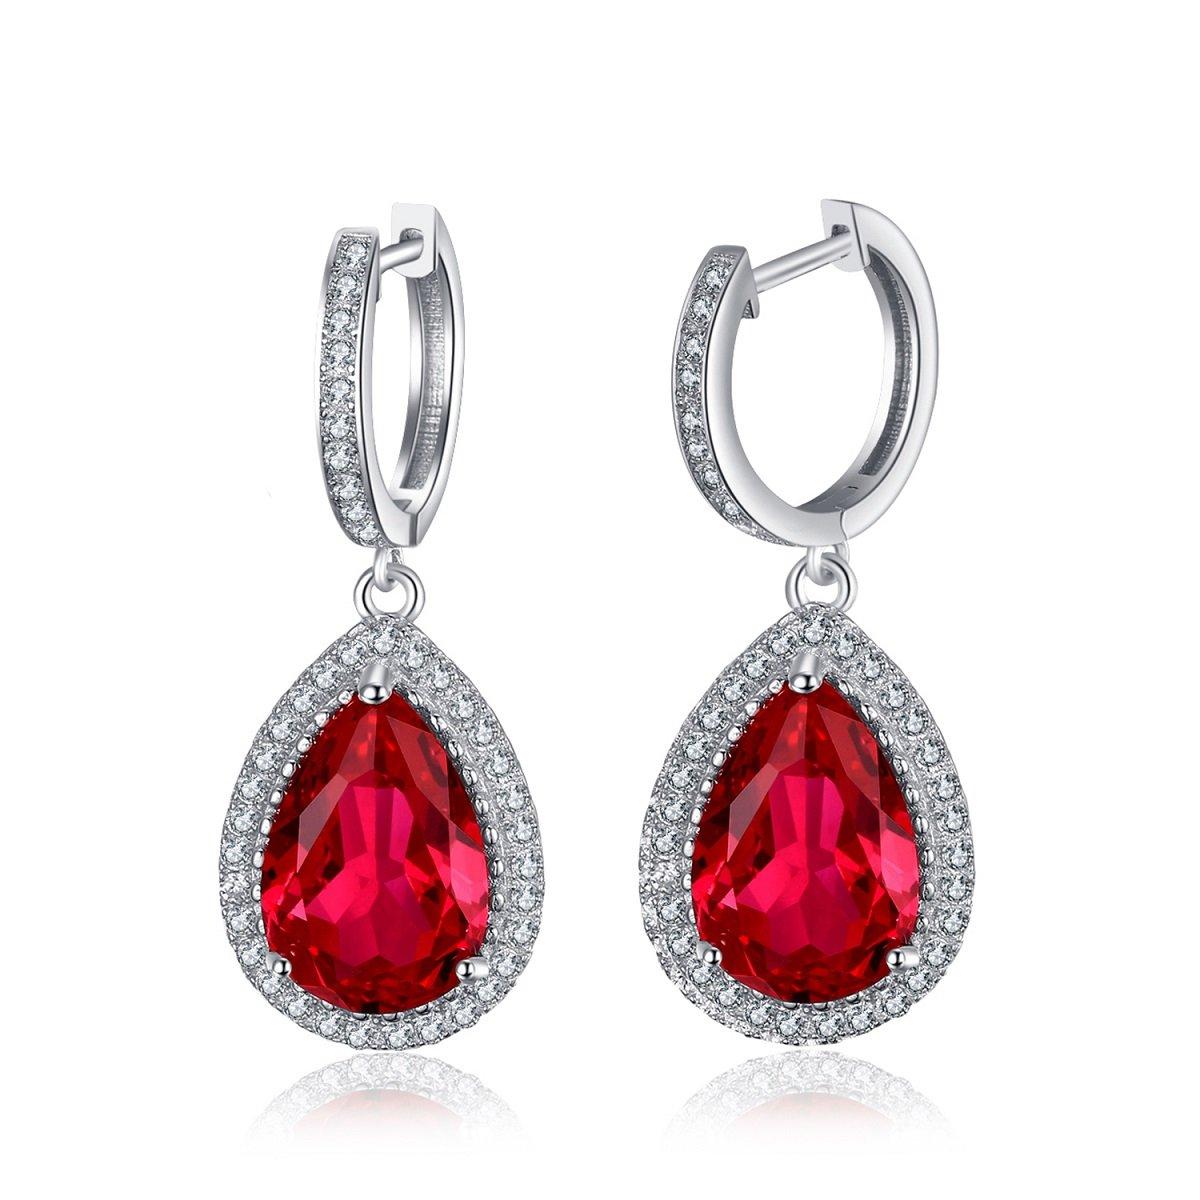 454de2b6cc6367 Amazon.com: Jewelrypalace Women's 9.34ct Synthetic Ruby 925 Sterling Silver  Drop Dangle Earrings: Jewelry